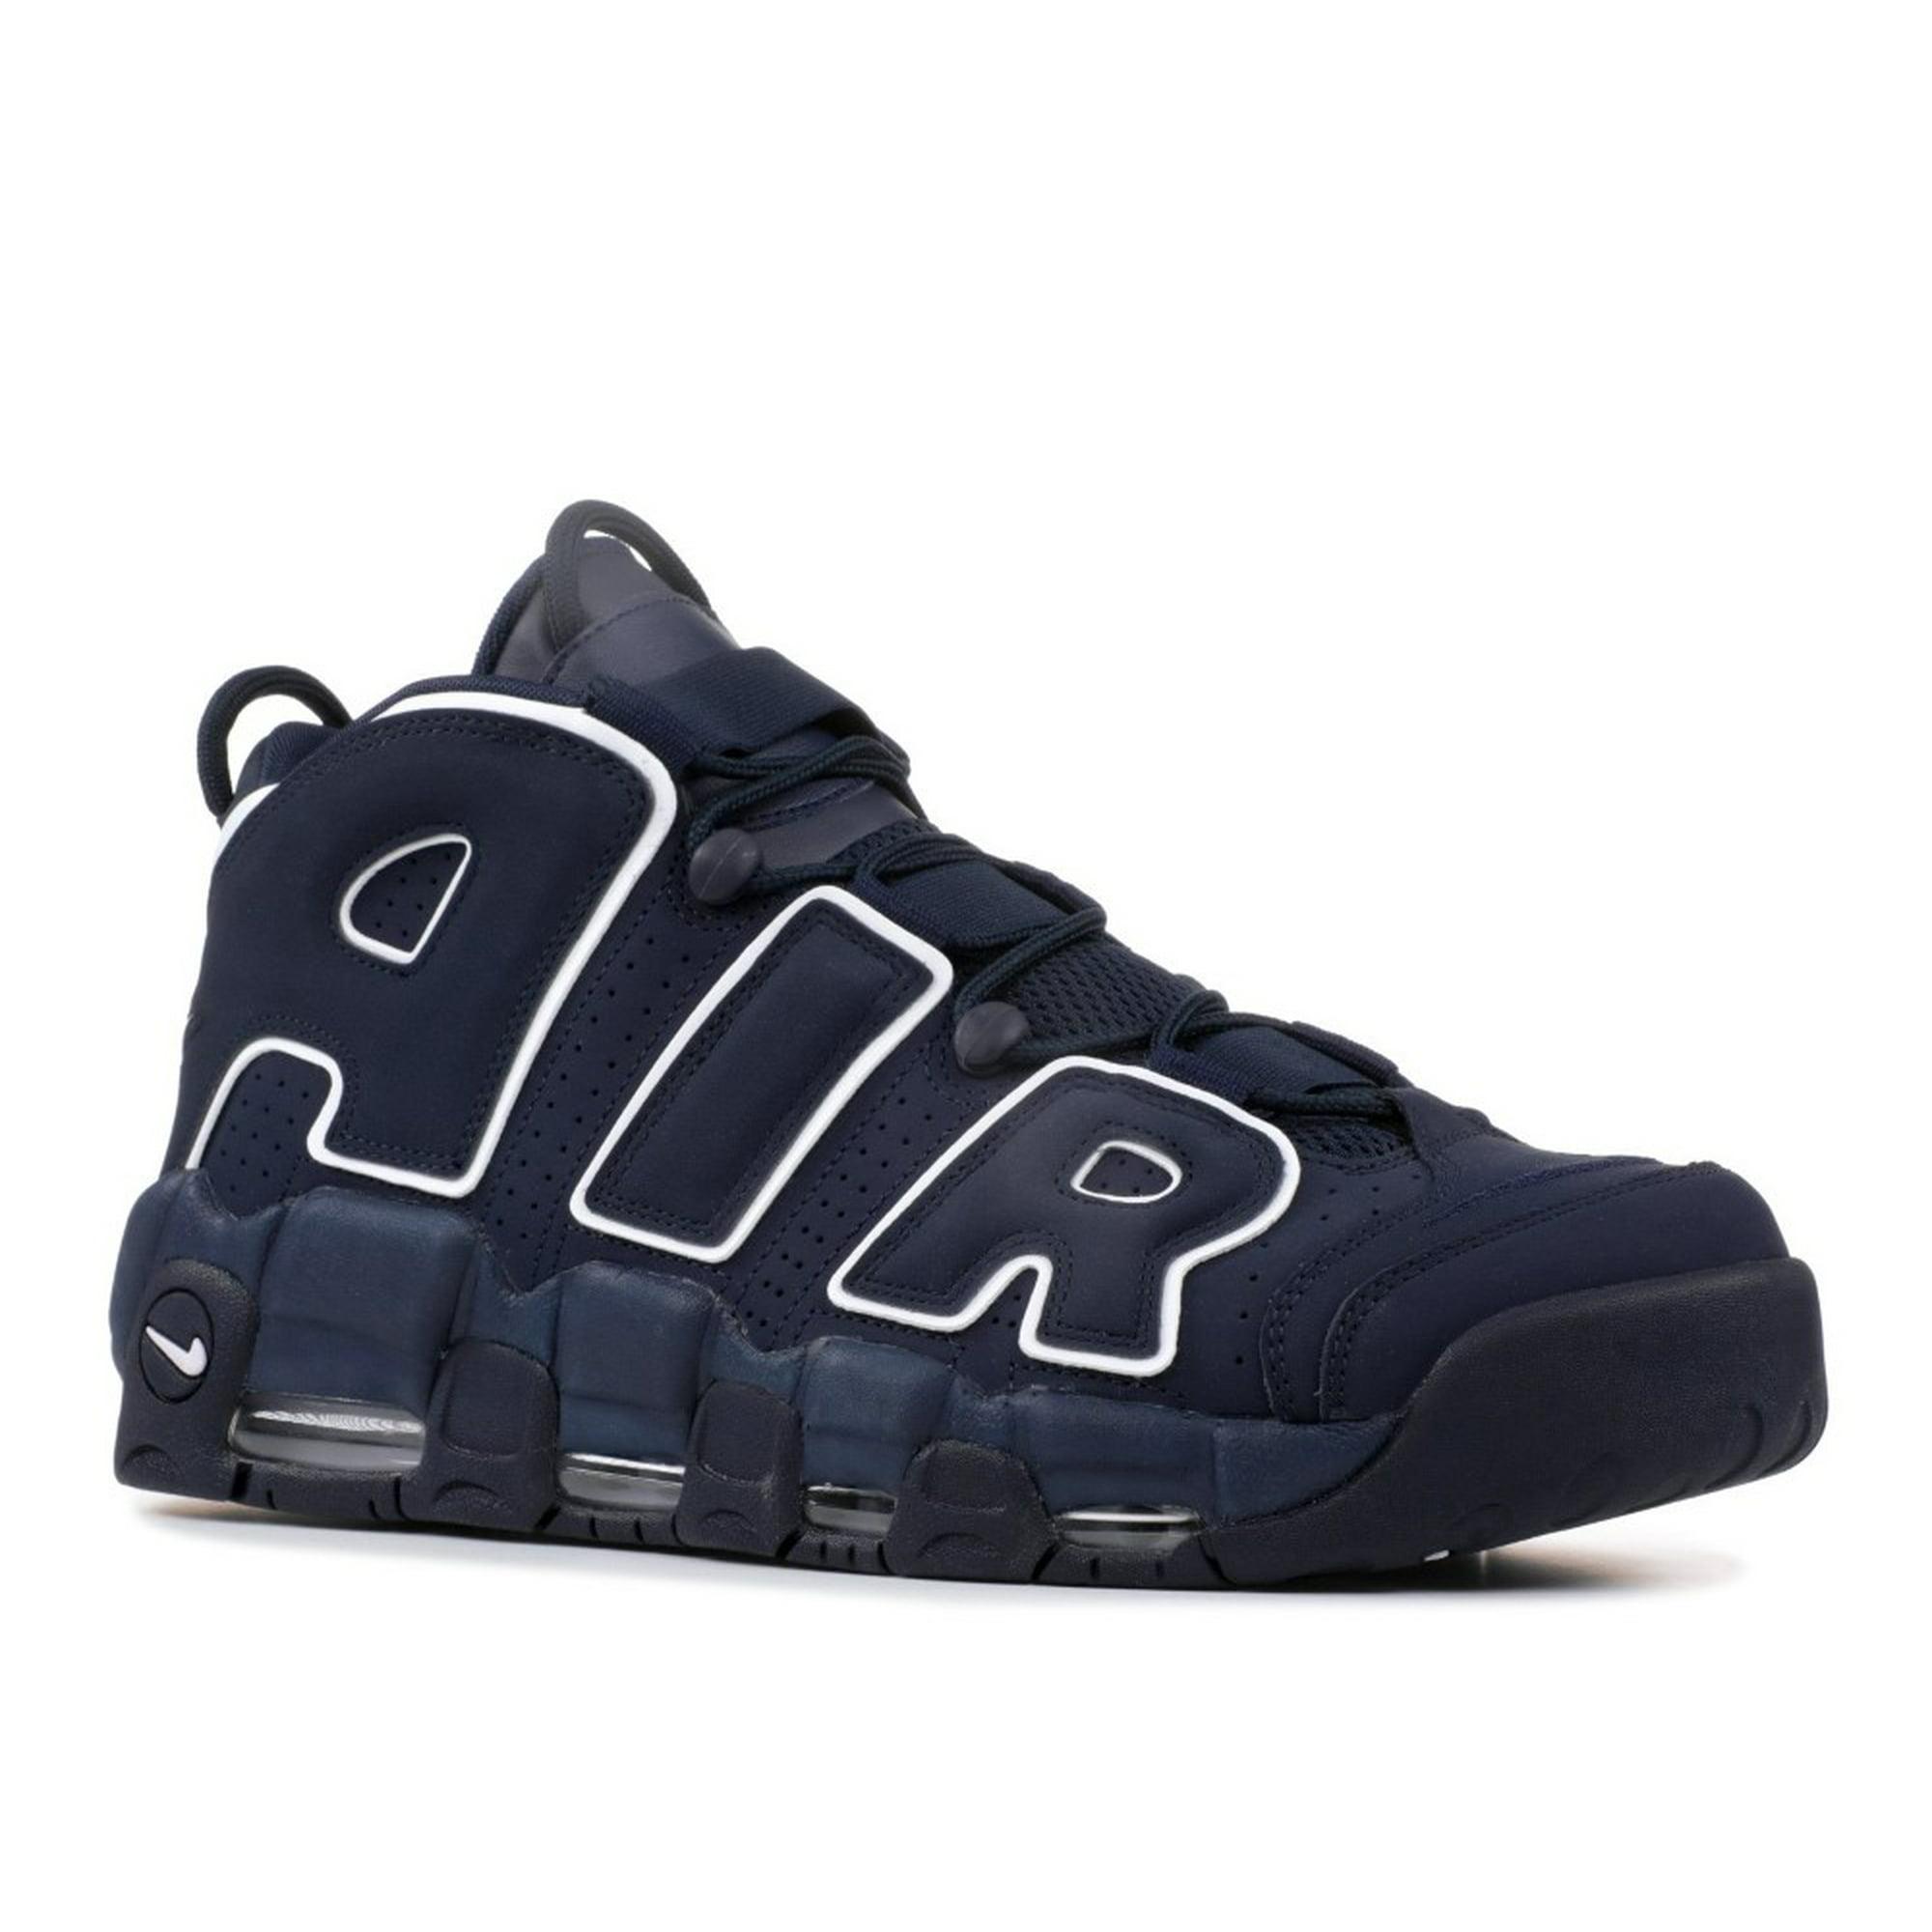 3f8314c5d2 Nike - Men - Air More Uptempo '96 'Obsidian' - 921948-400 - Size 7.5 |  Walmart Canada